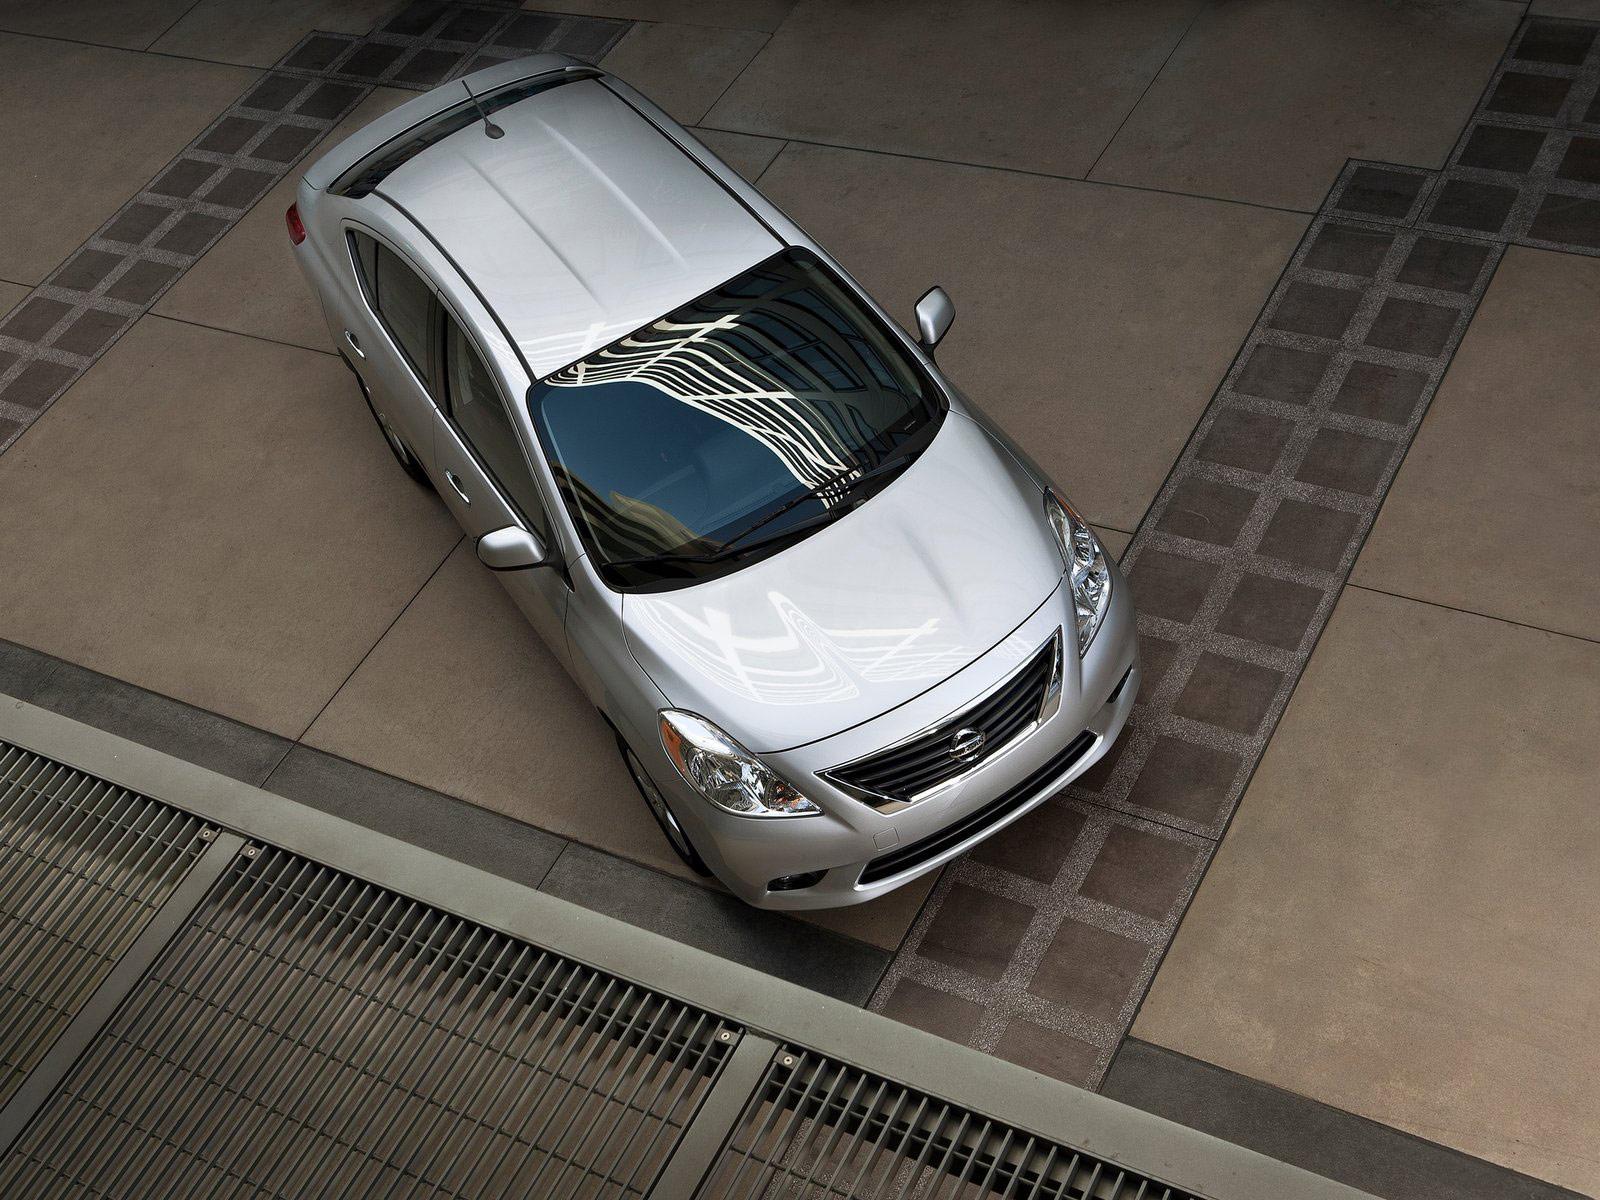 http://2.bp.blogspot.com/-Bc7Lci-VWp4/TqyFS1G7nrI/AAAAAAAAHBY/-69OBHHzWiM/s1600/Nissan_Versa_Sedan_2012_japanese-car-wallpapers_3.jpg